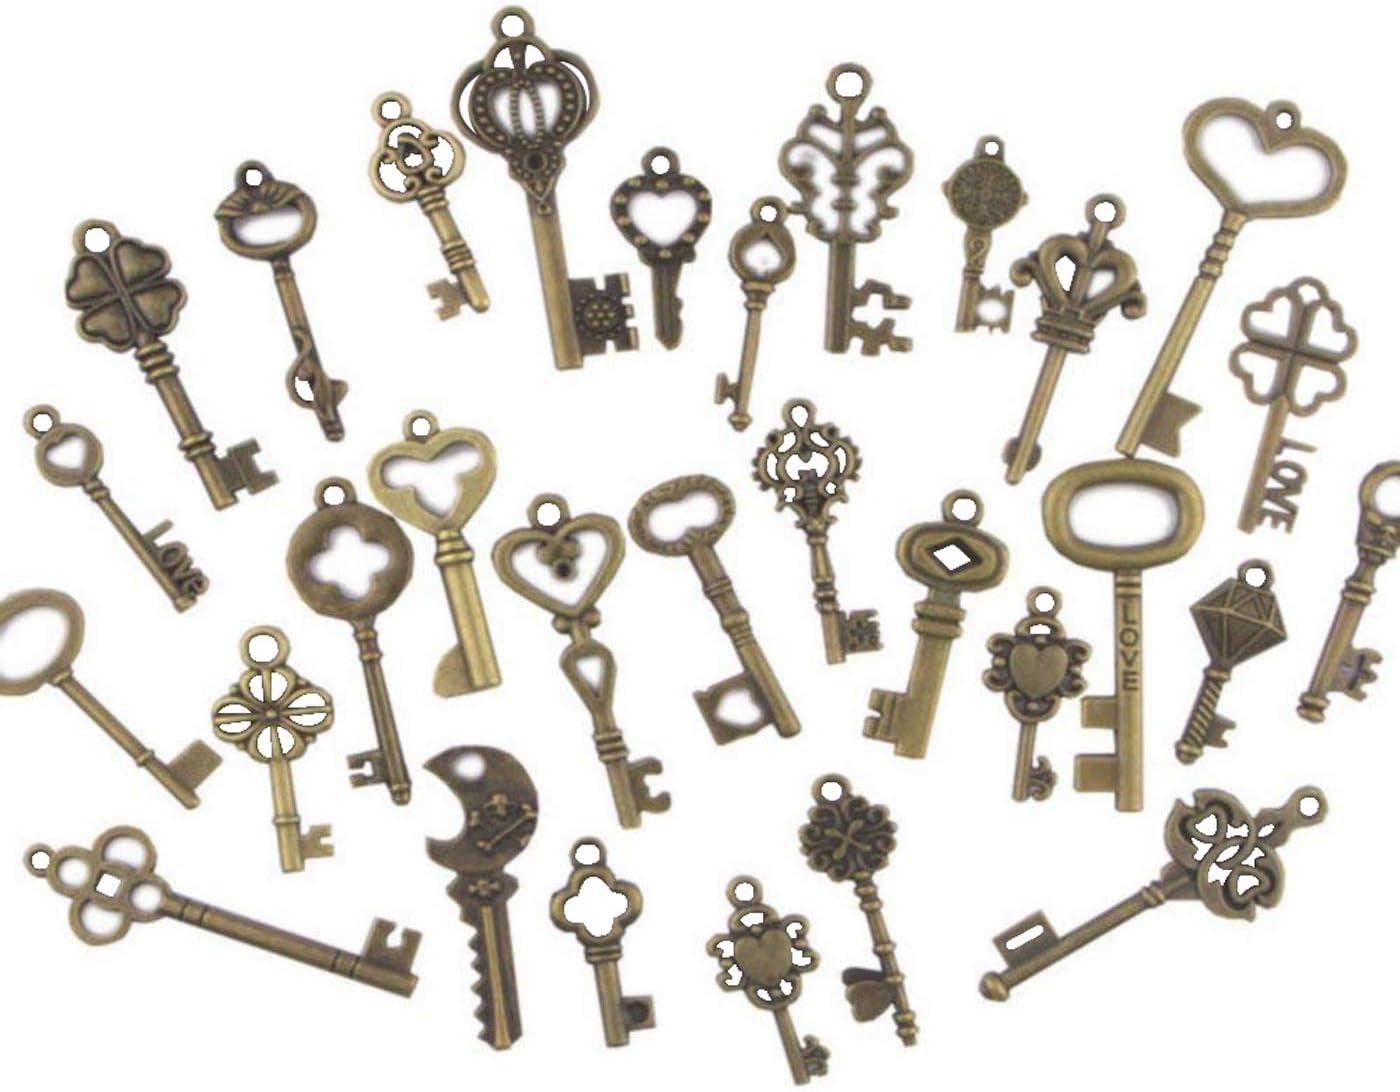 Swity Home 120 Pack Skeleton Keys, 30 Keys in Antique Bronze, Charm Set DIY Handmade Accessories Necklace Pendants, Set of 120 Keys